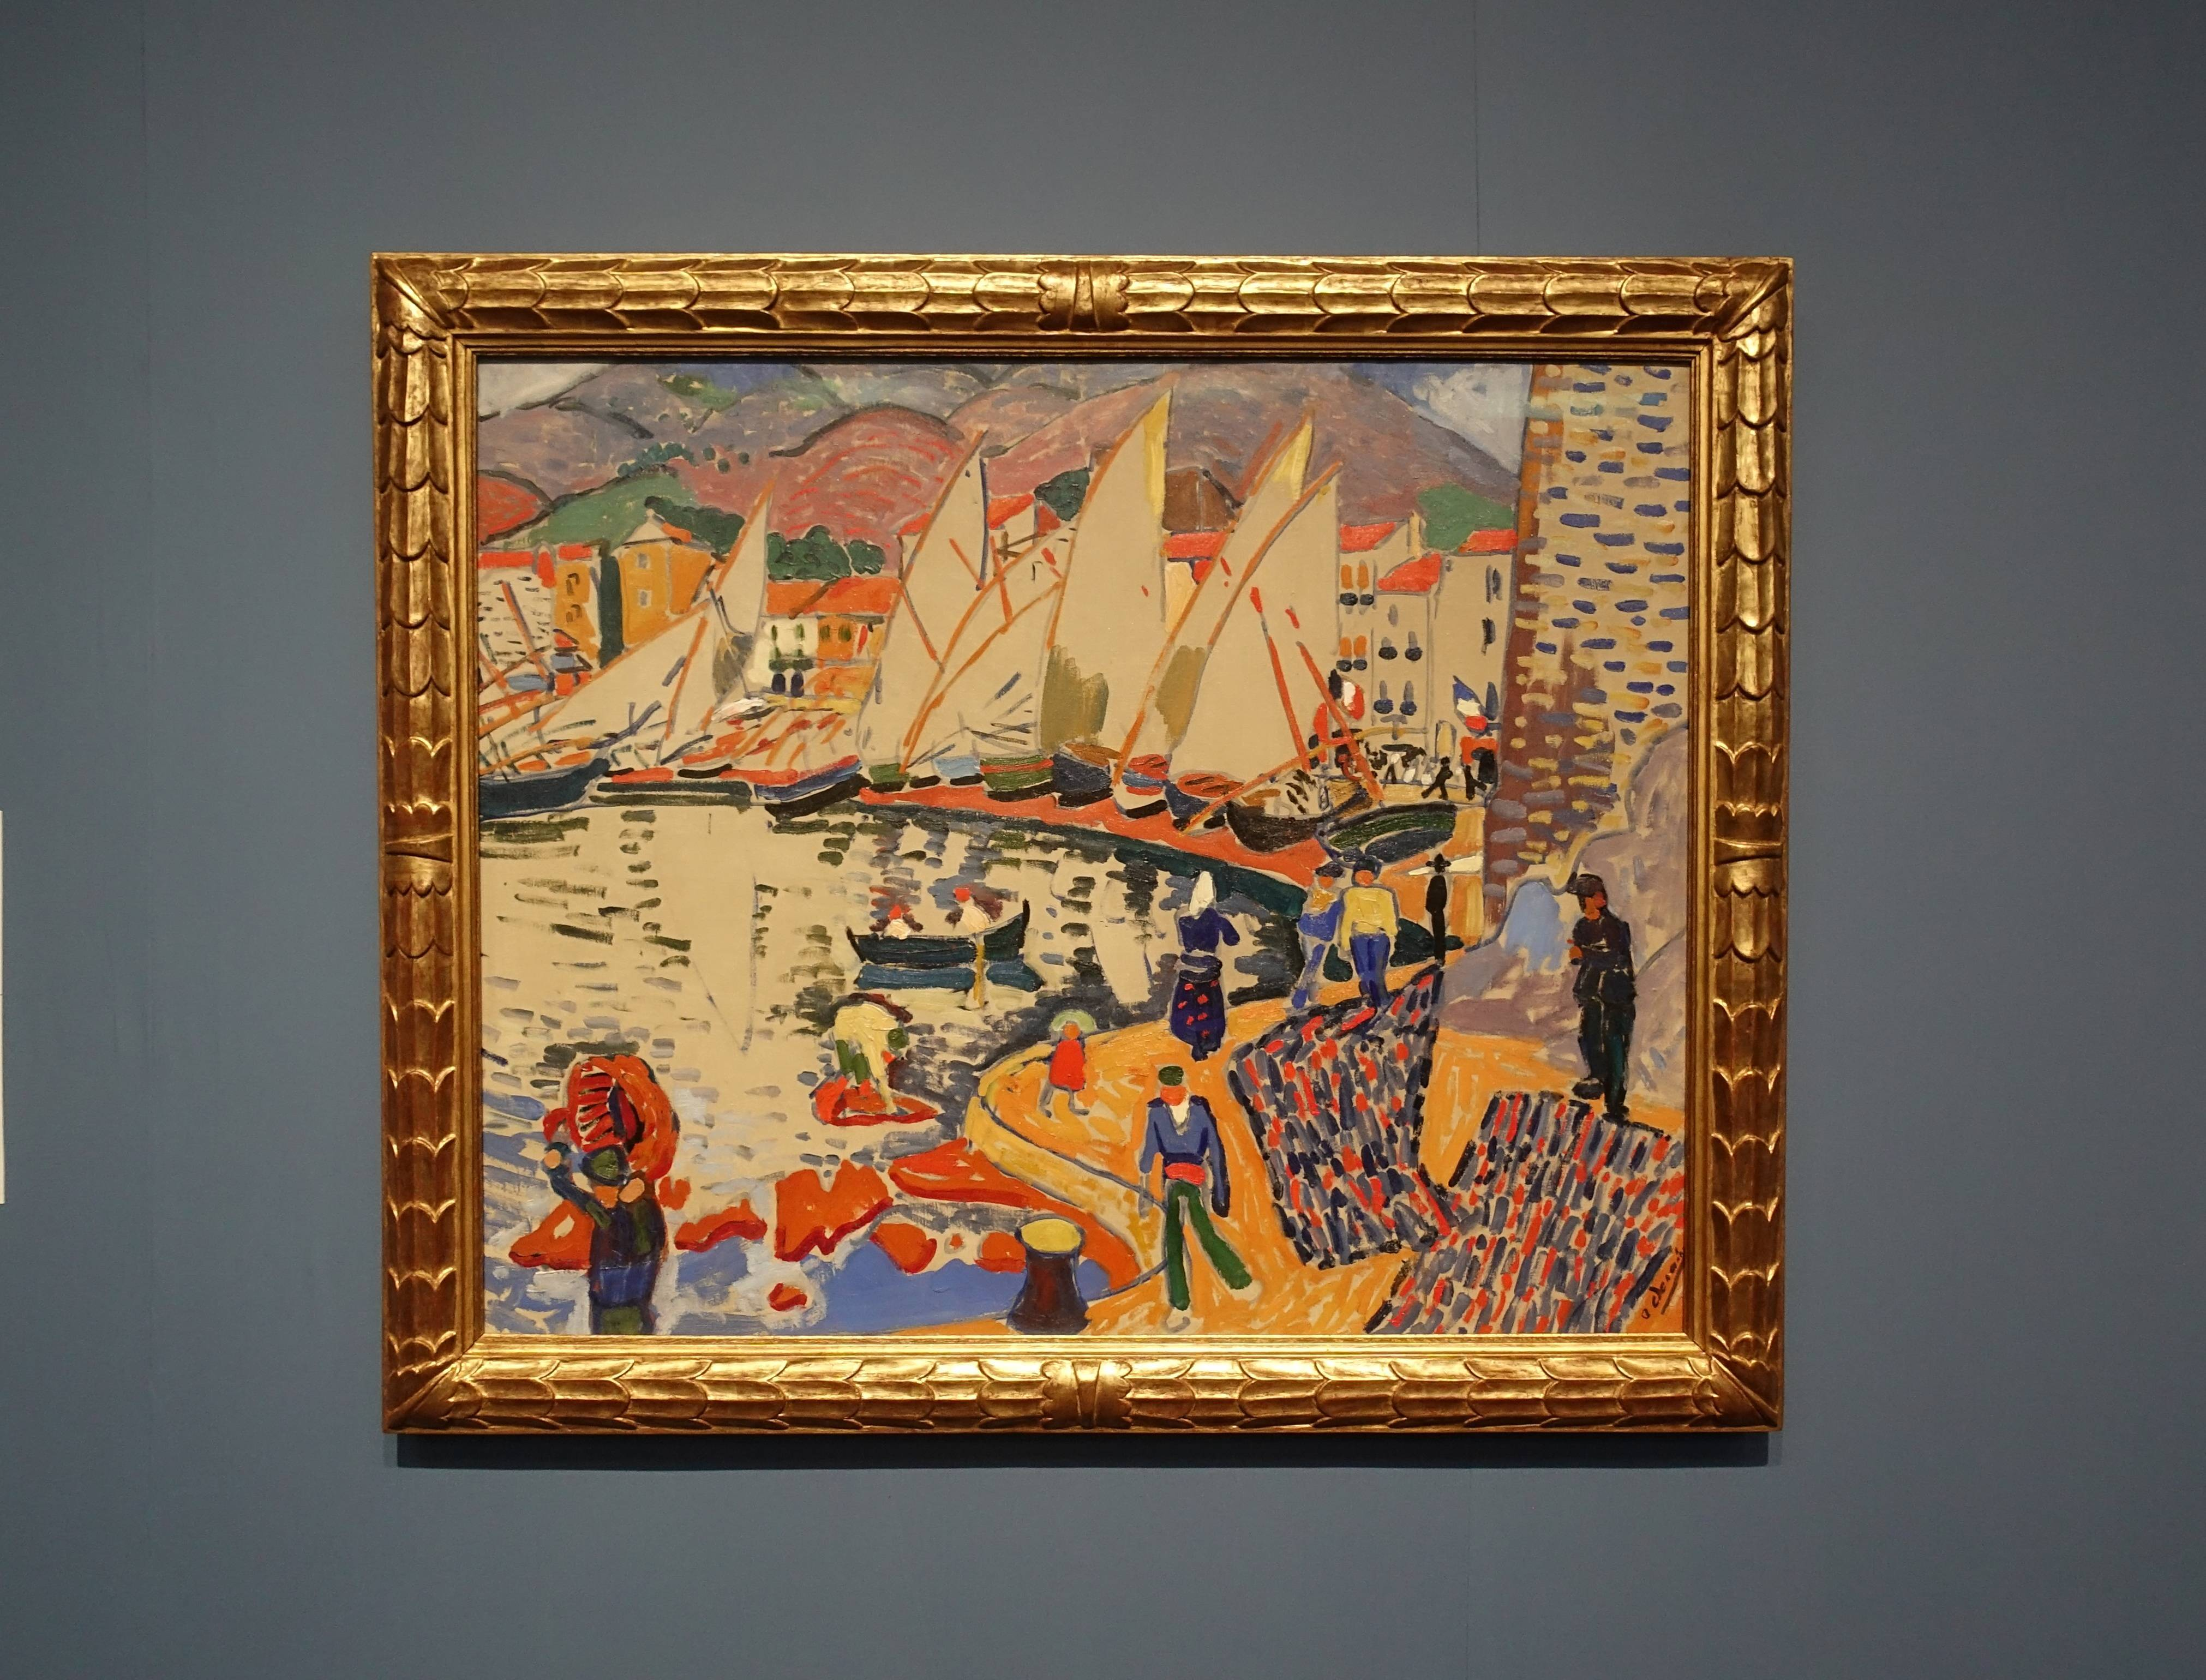 安德烈•德罕 André Derain,《曬船帆 Drying the Sails》,油彩、畫布 Oil on canvas,1905。